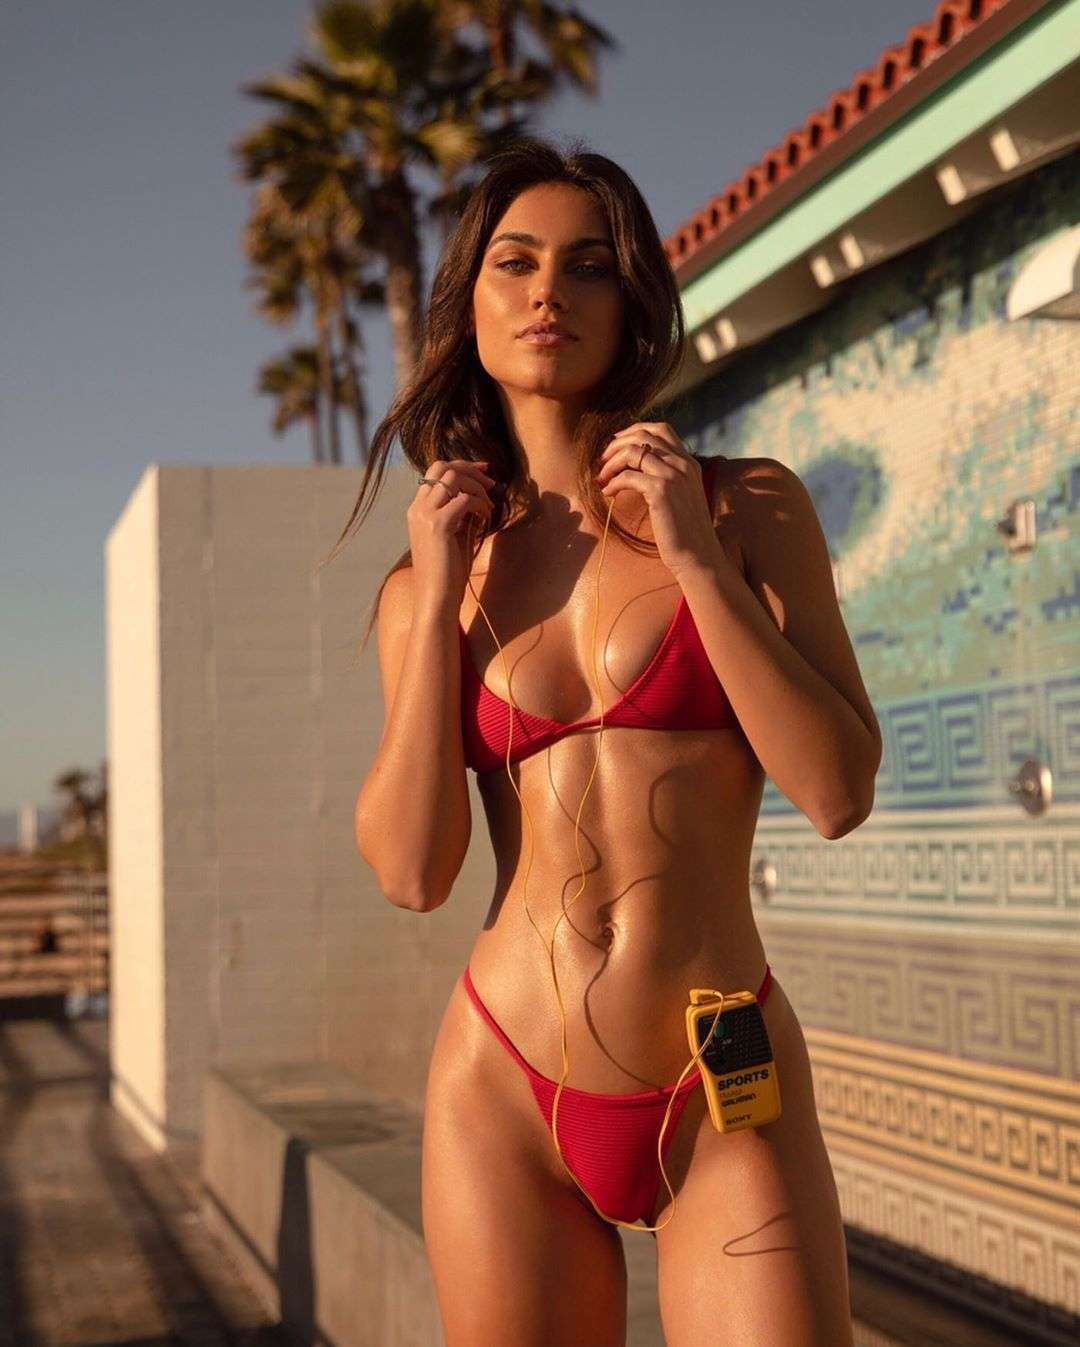 Steph Rayner Nude photo 25